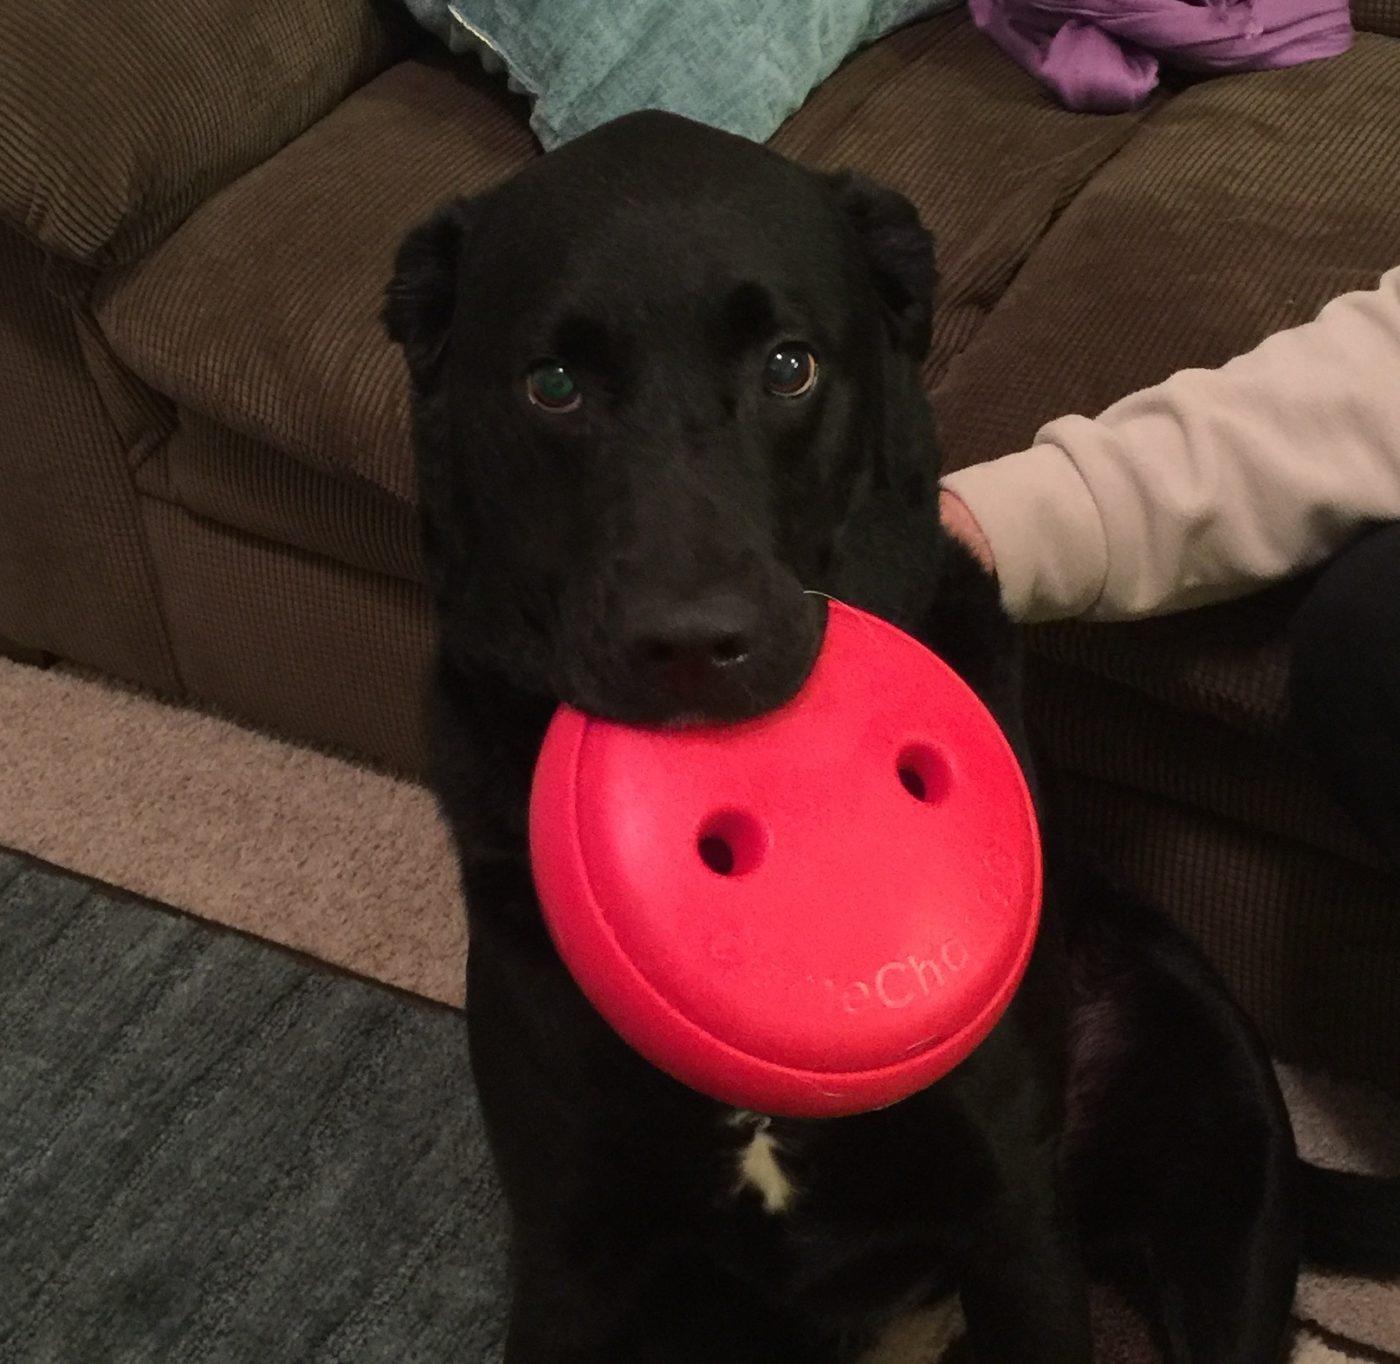 #labradordogtraining #lovelabradors #stopdogaggression #charlottedogtraining